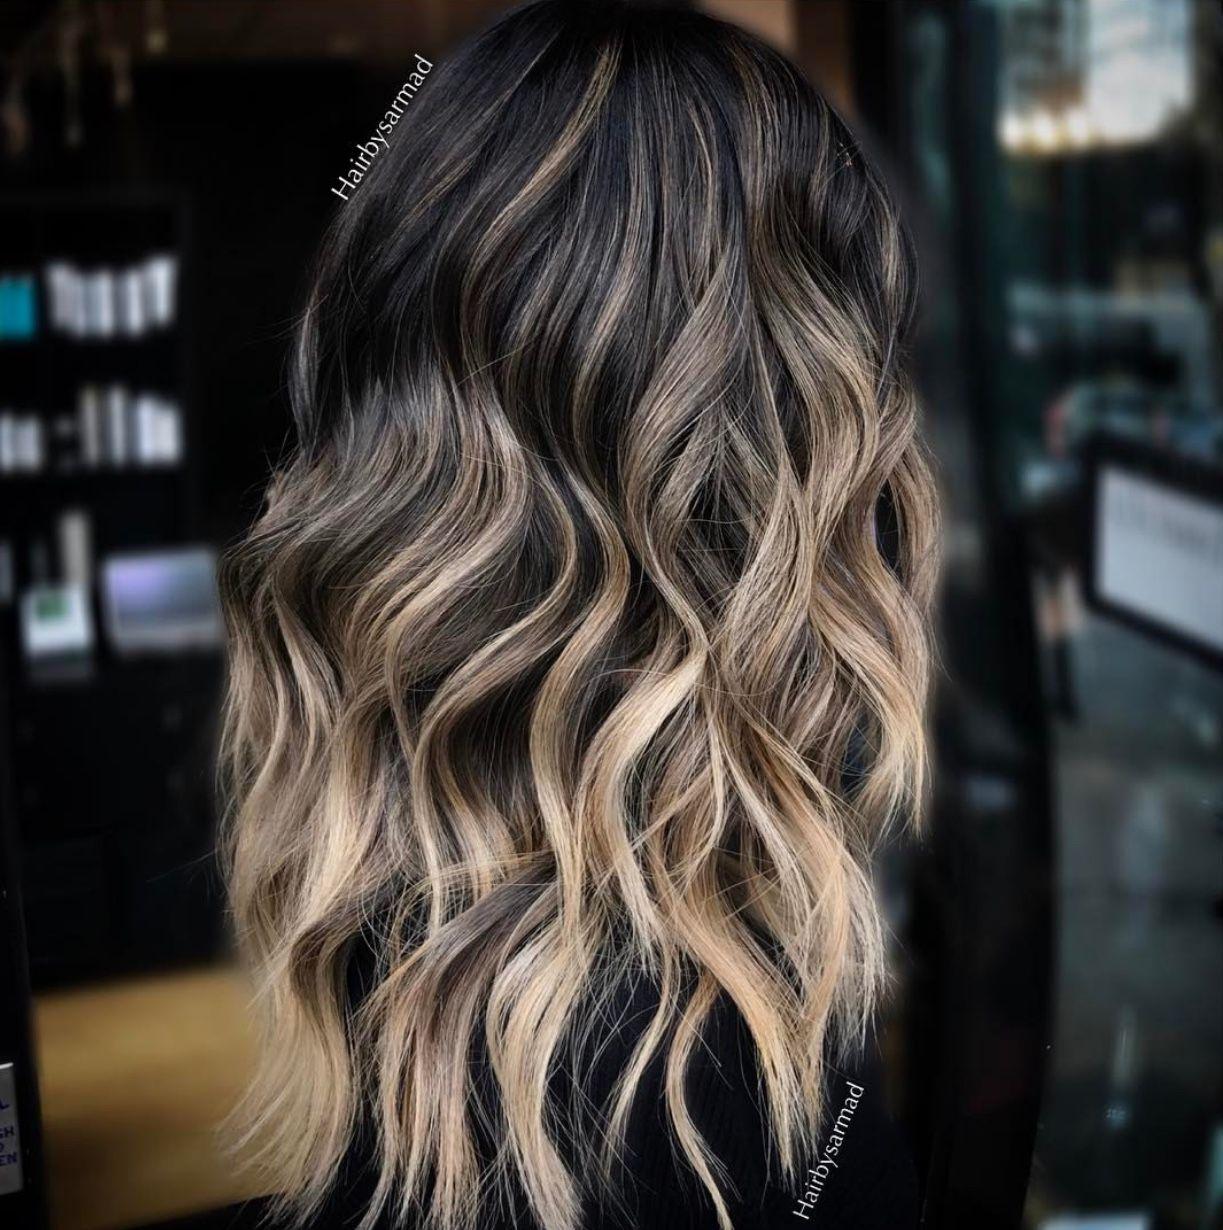 Pin By G On The Inner Hair Beauty Pinterest